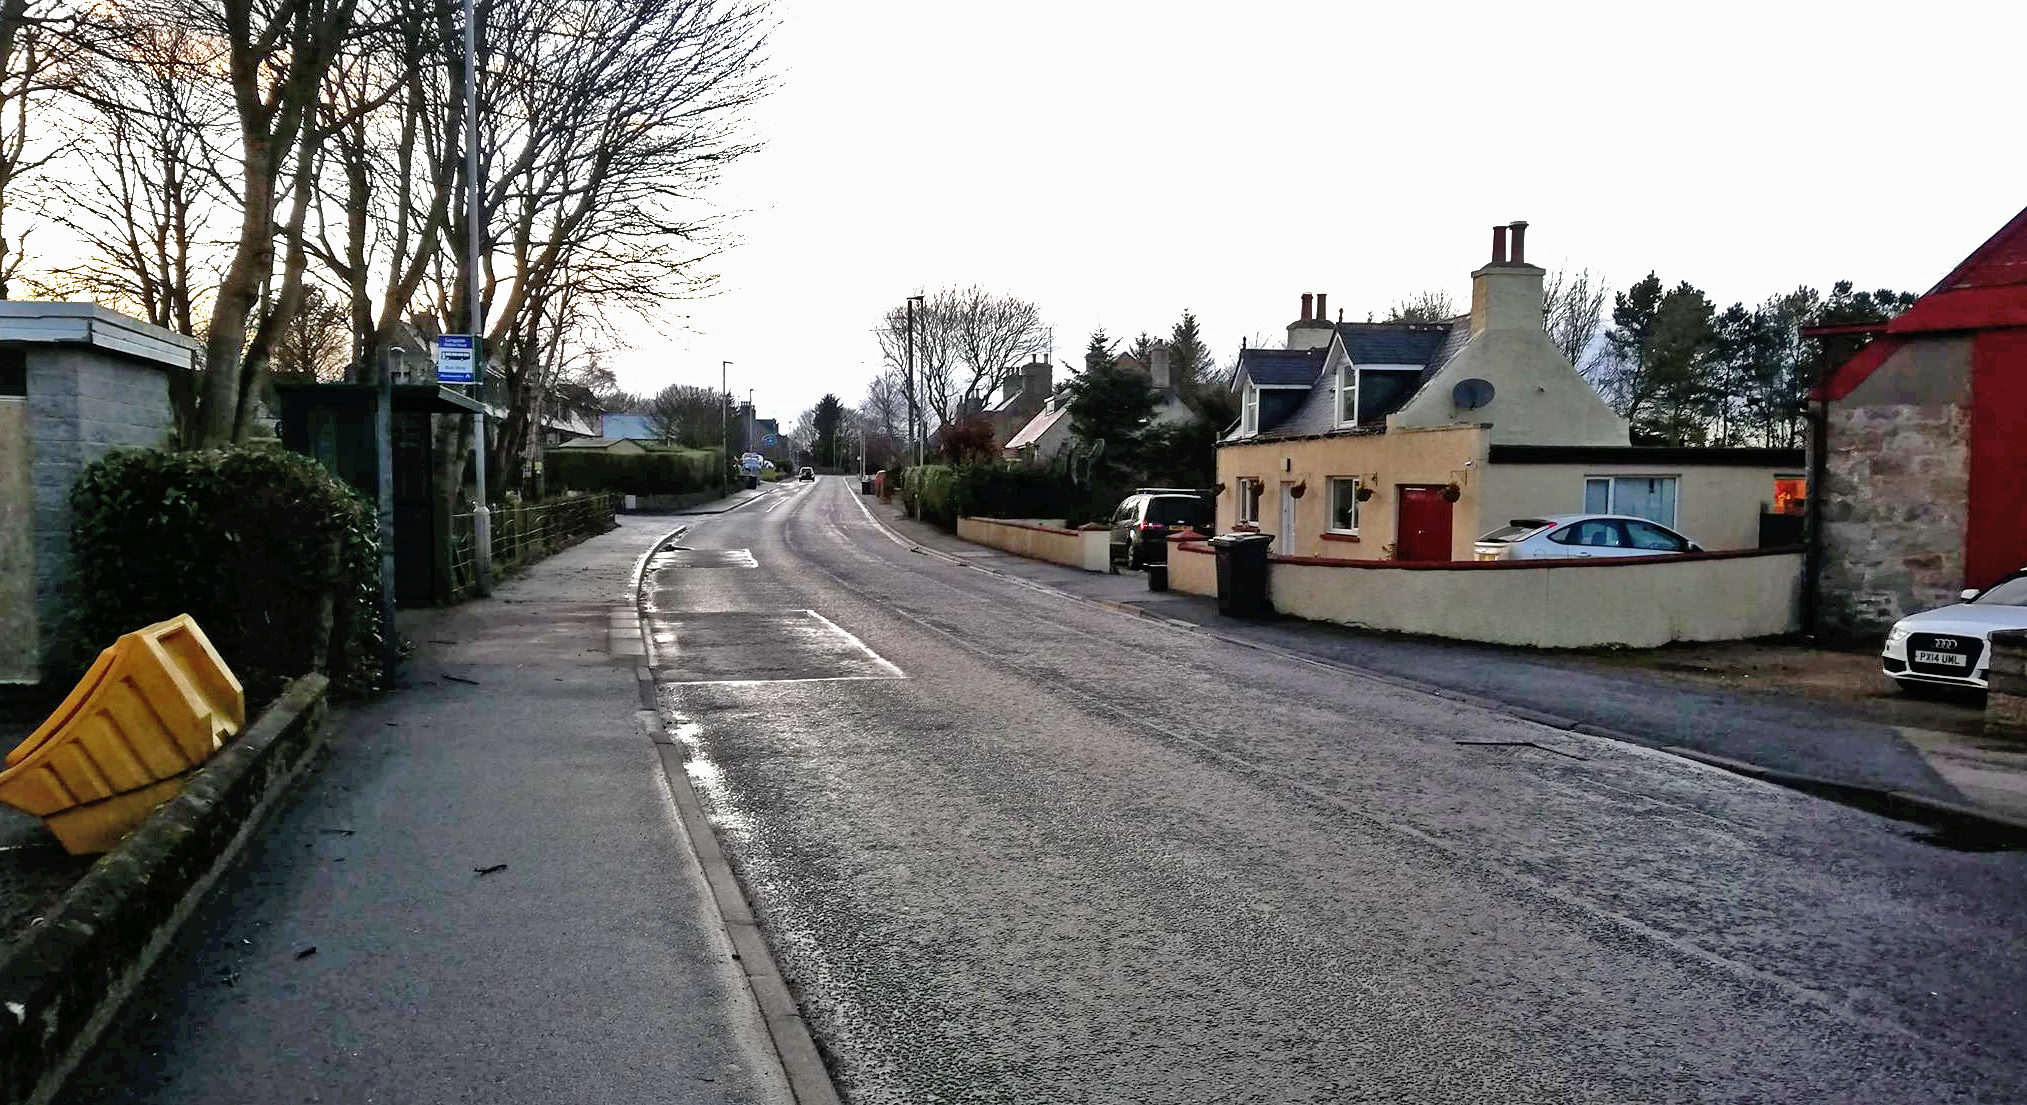 Main Street in the Aberdeenshire town of Longside. Picture by Rebekah McVey